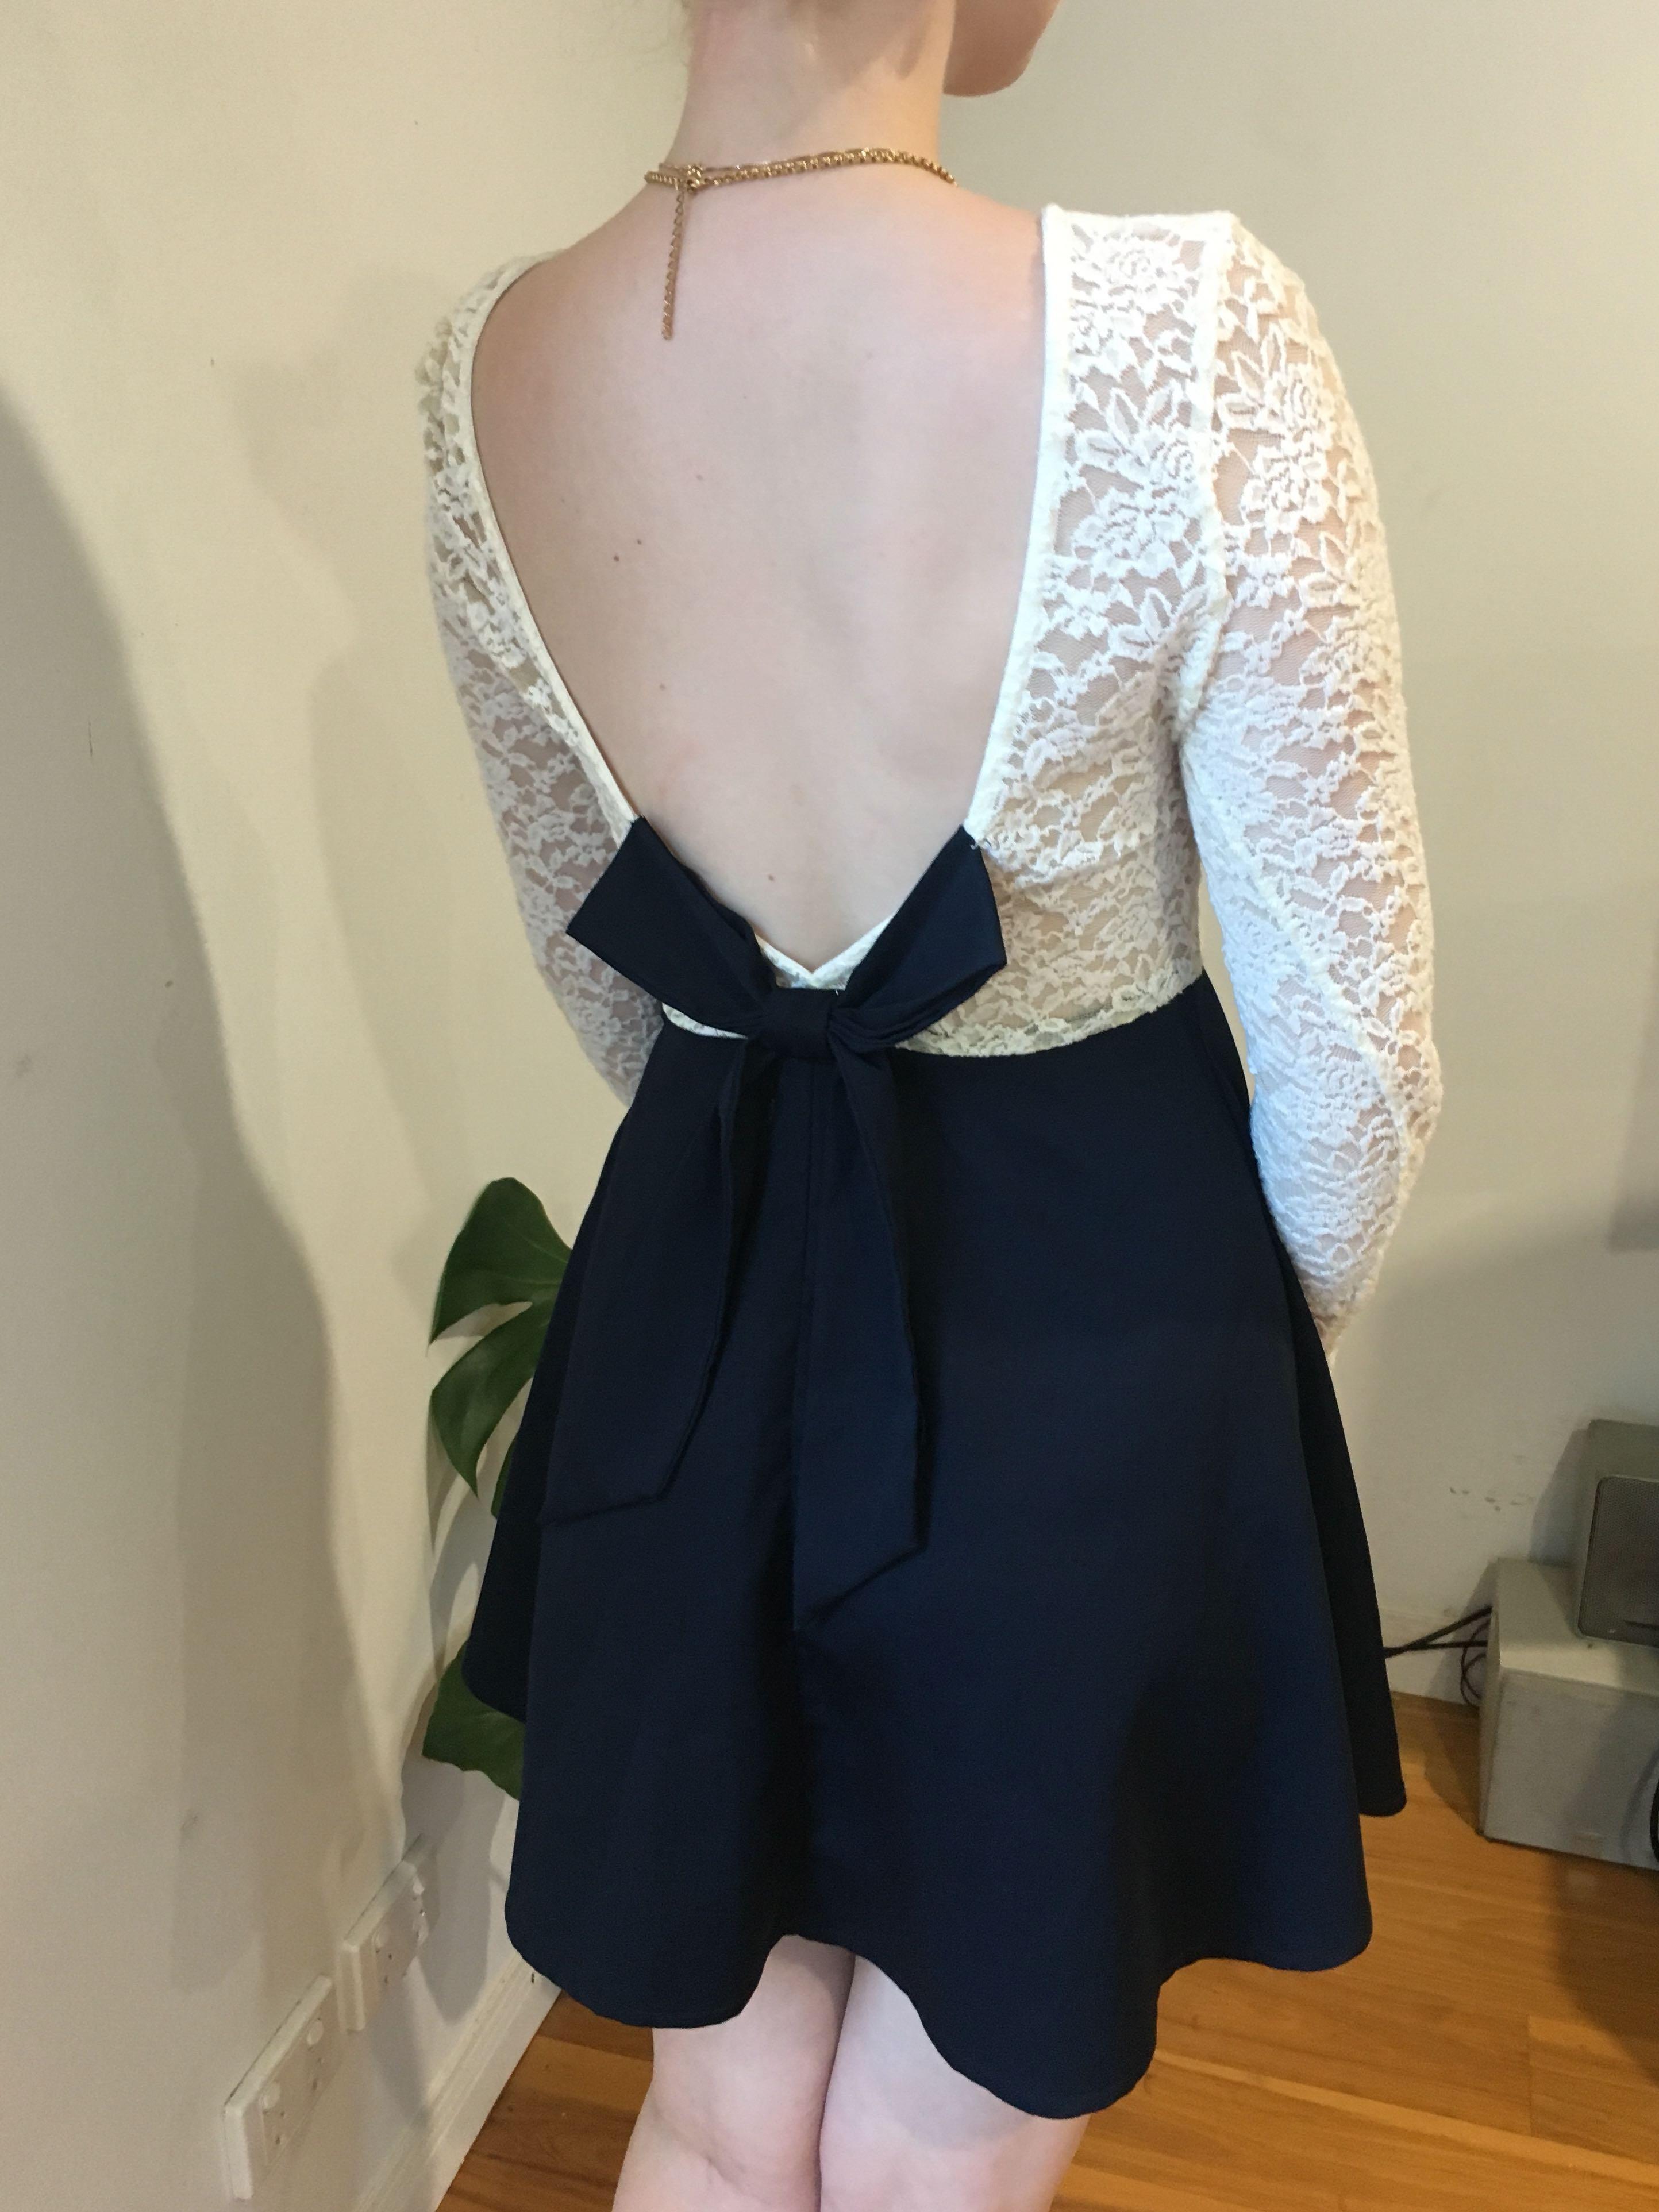 🎶Vintage 20s Styled Dress